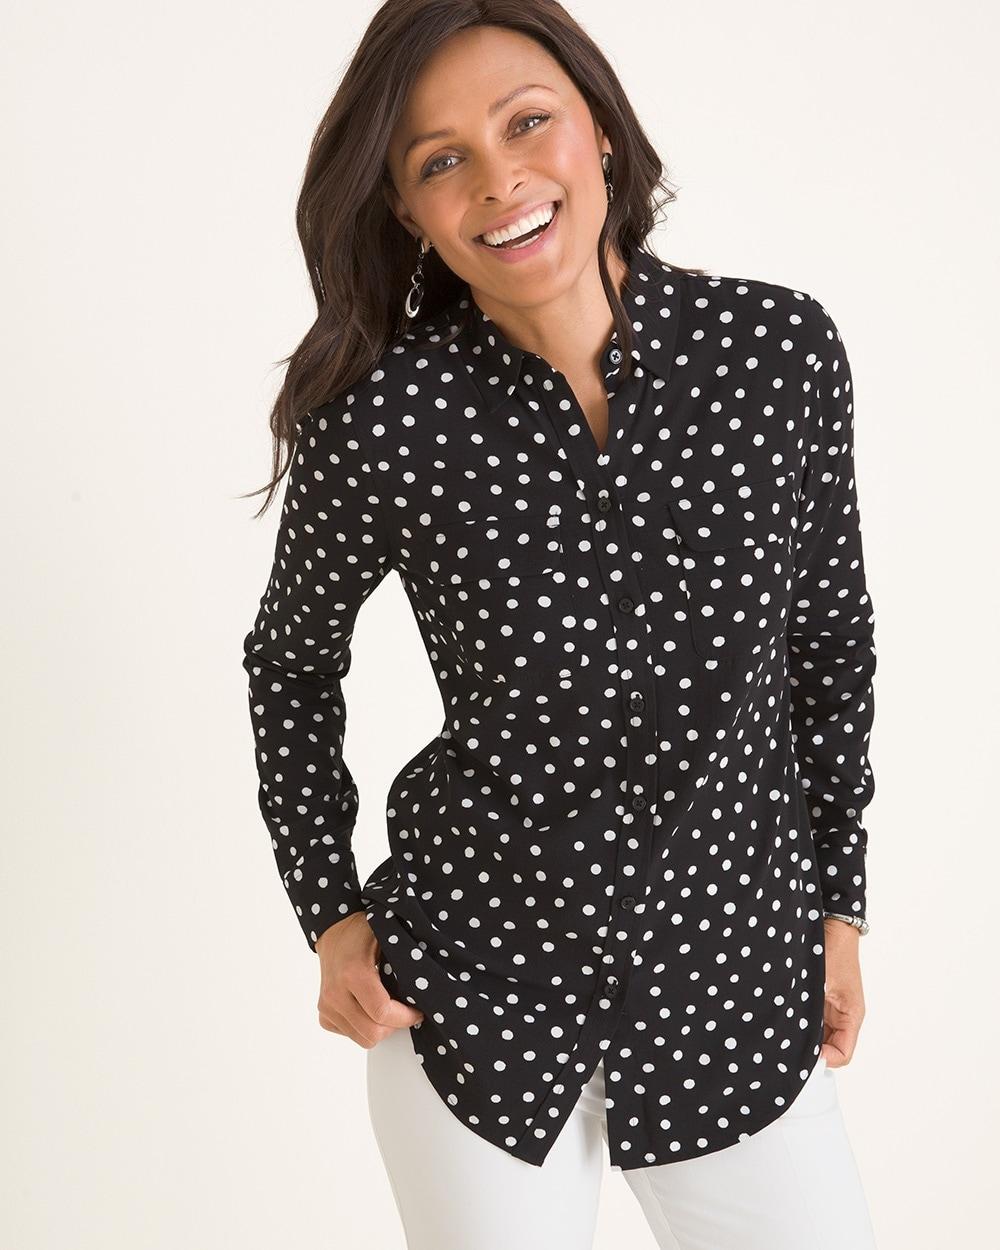 Silky Soft Dot Shirt